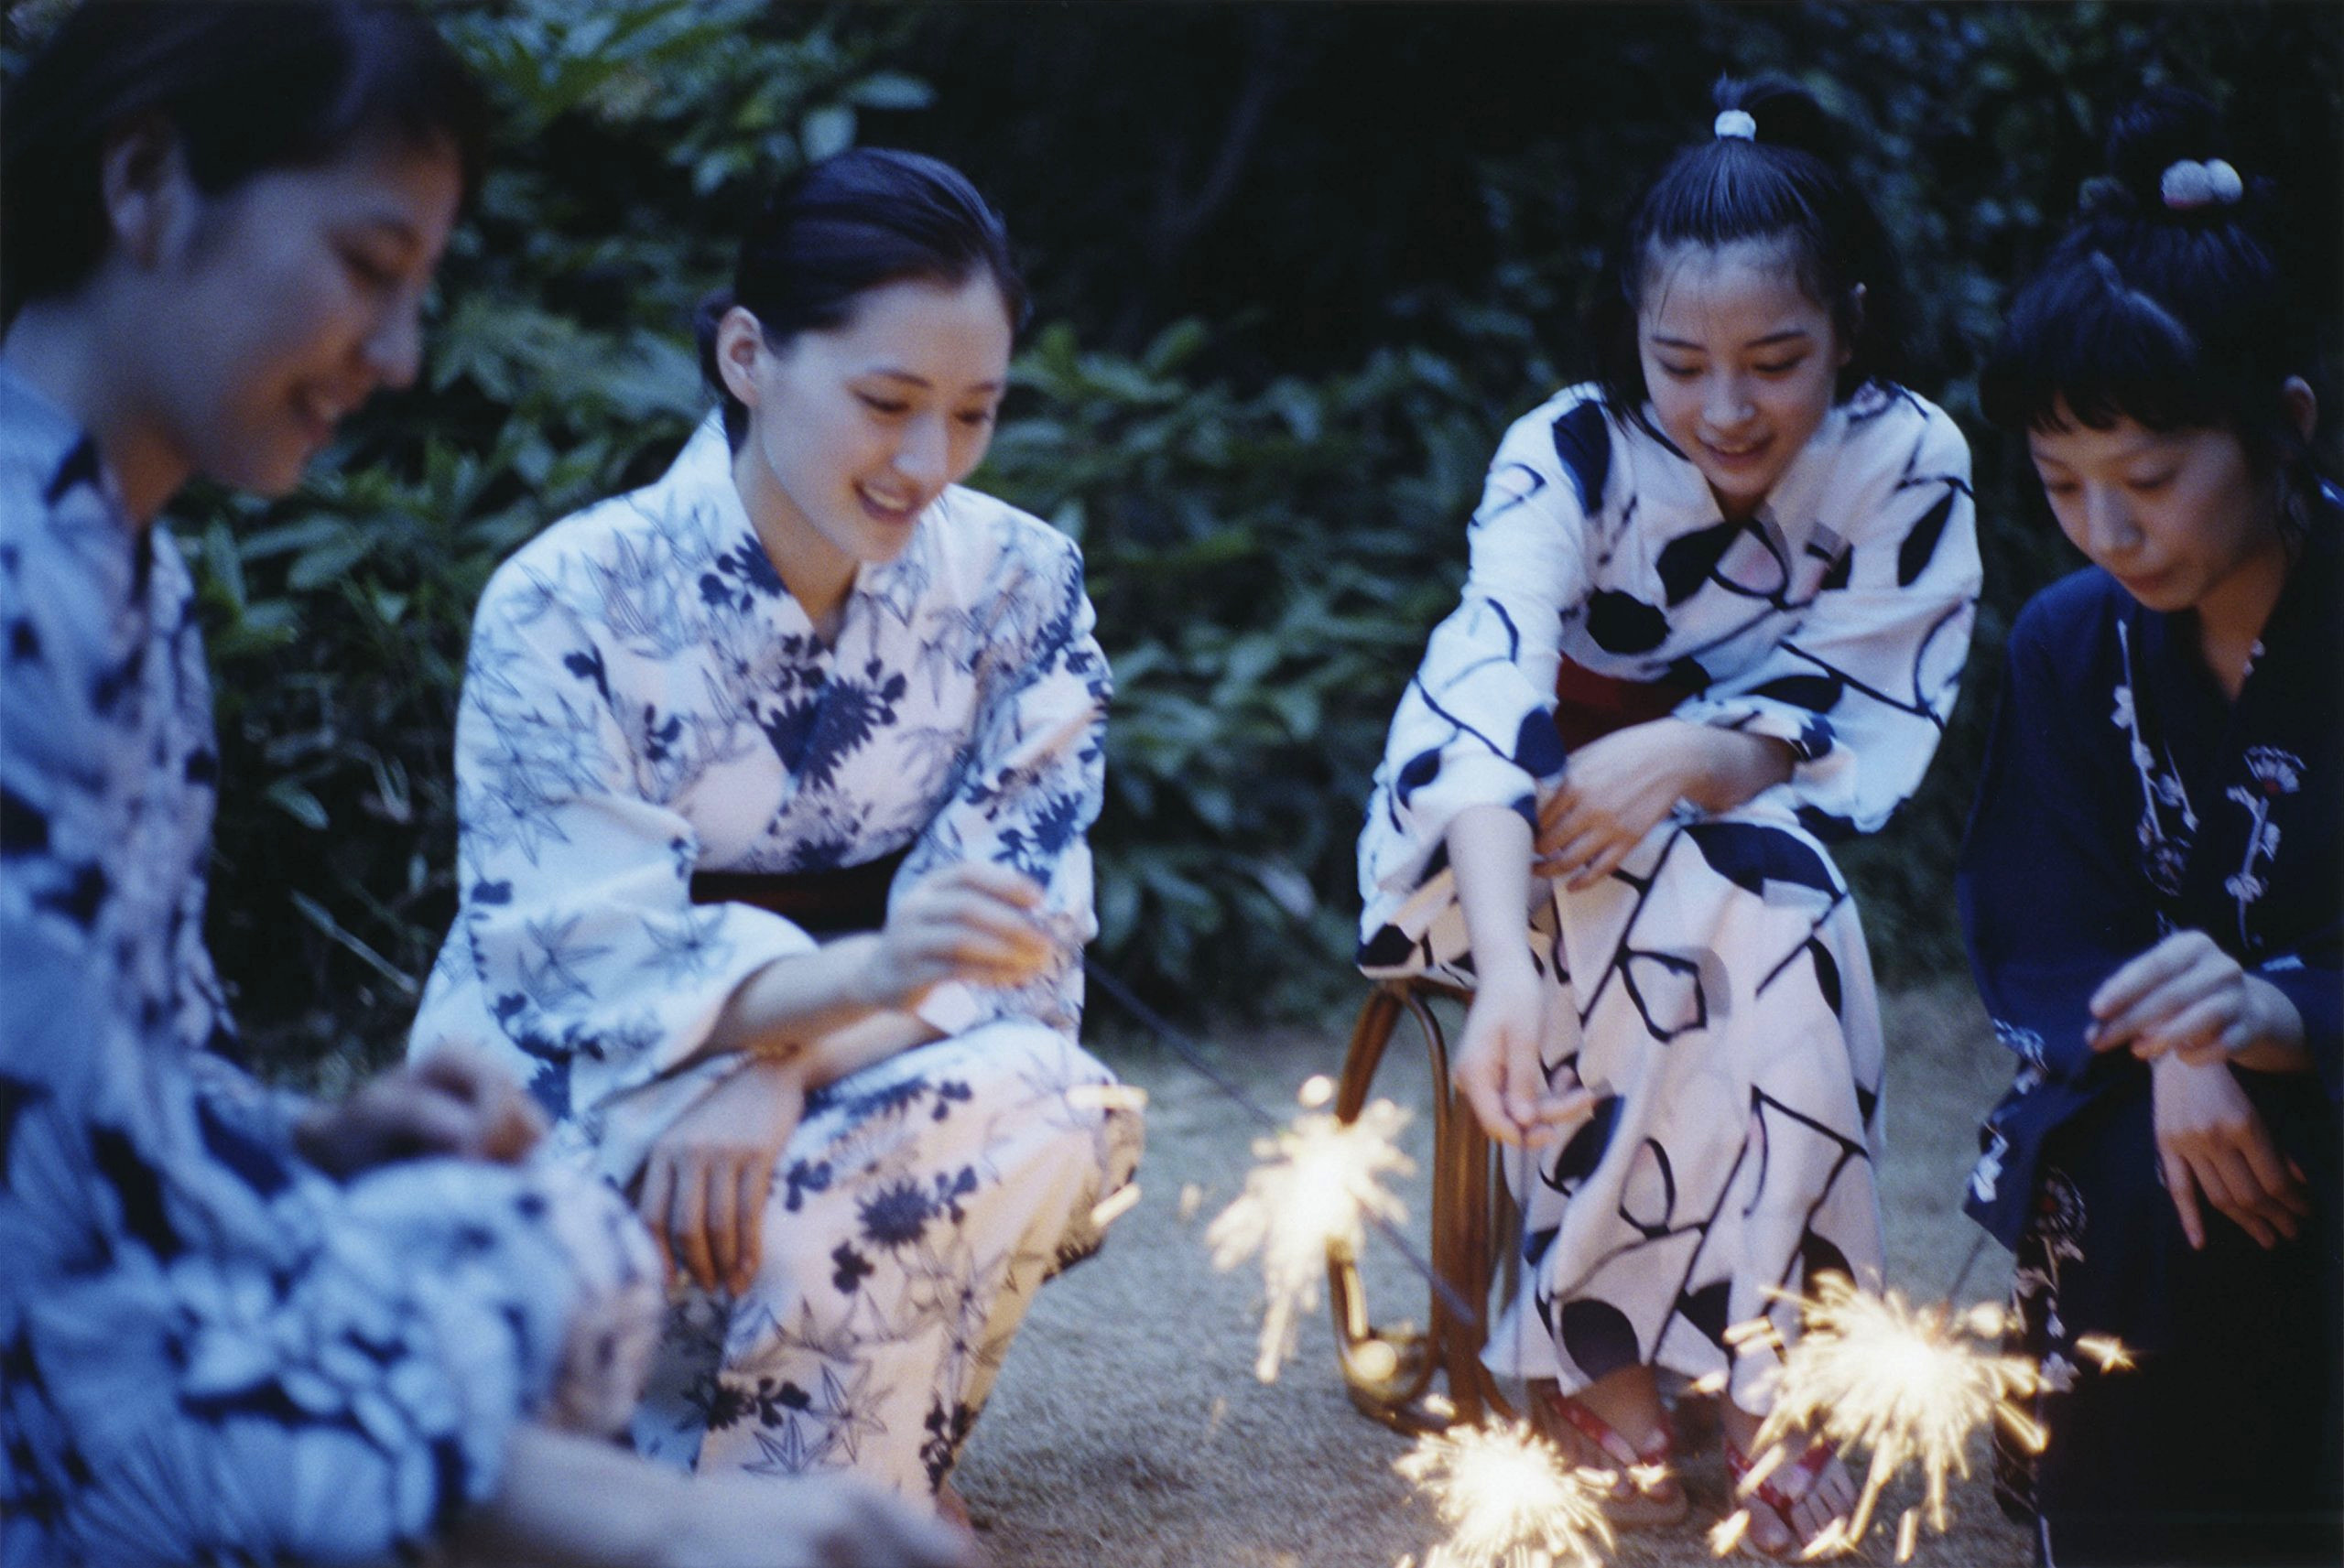 Four young women in yukata, holding sparklers.